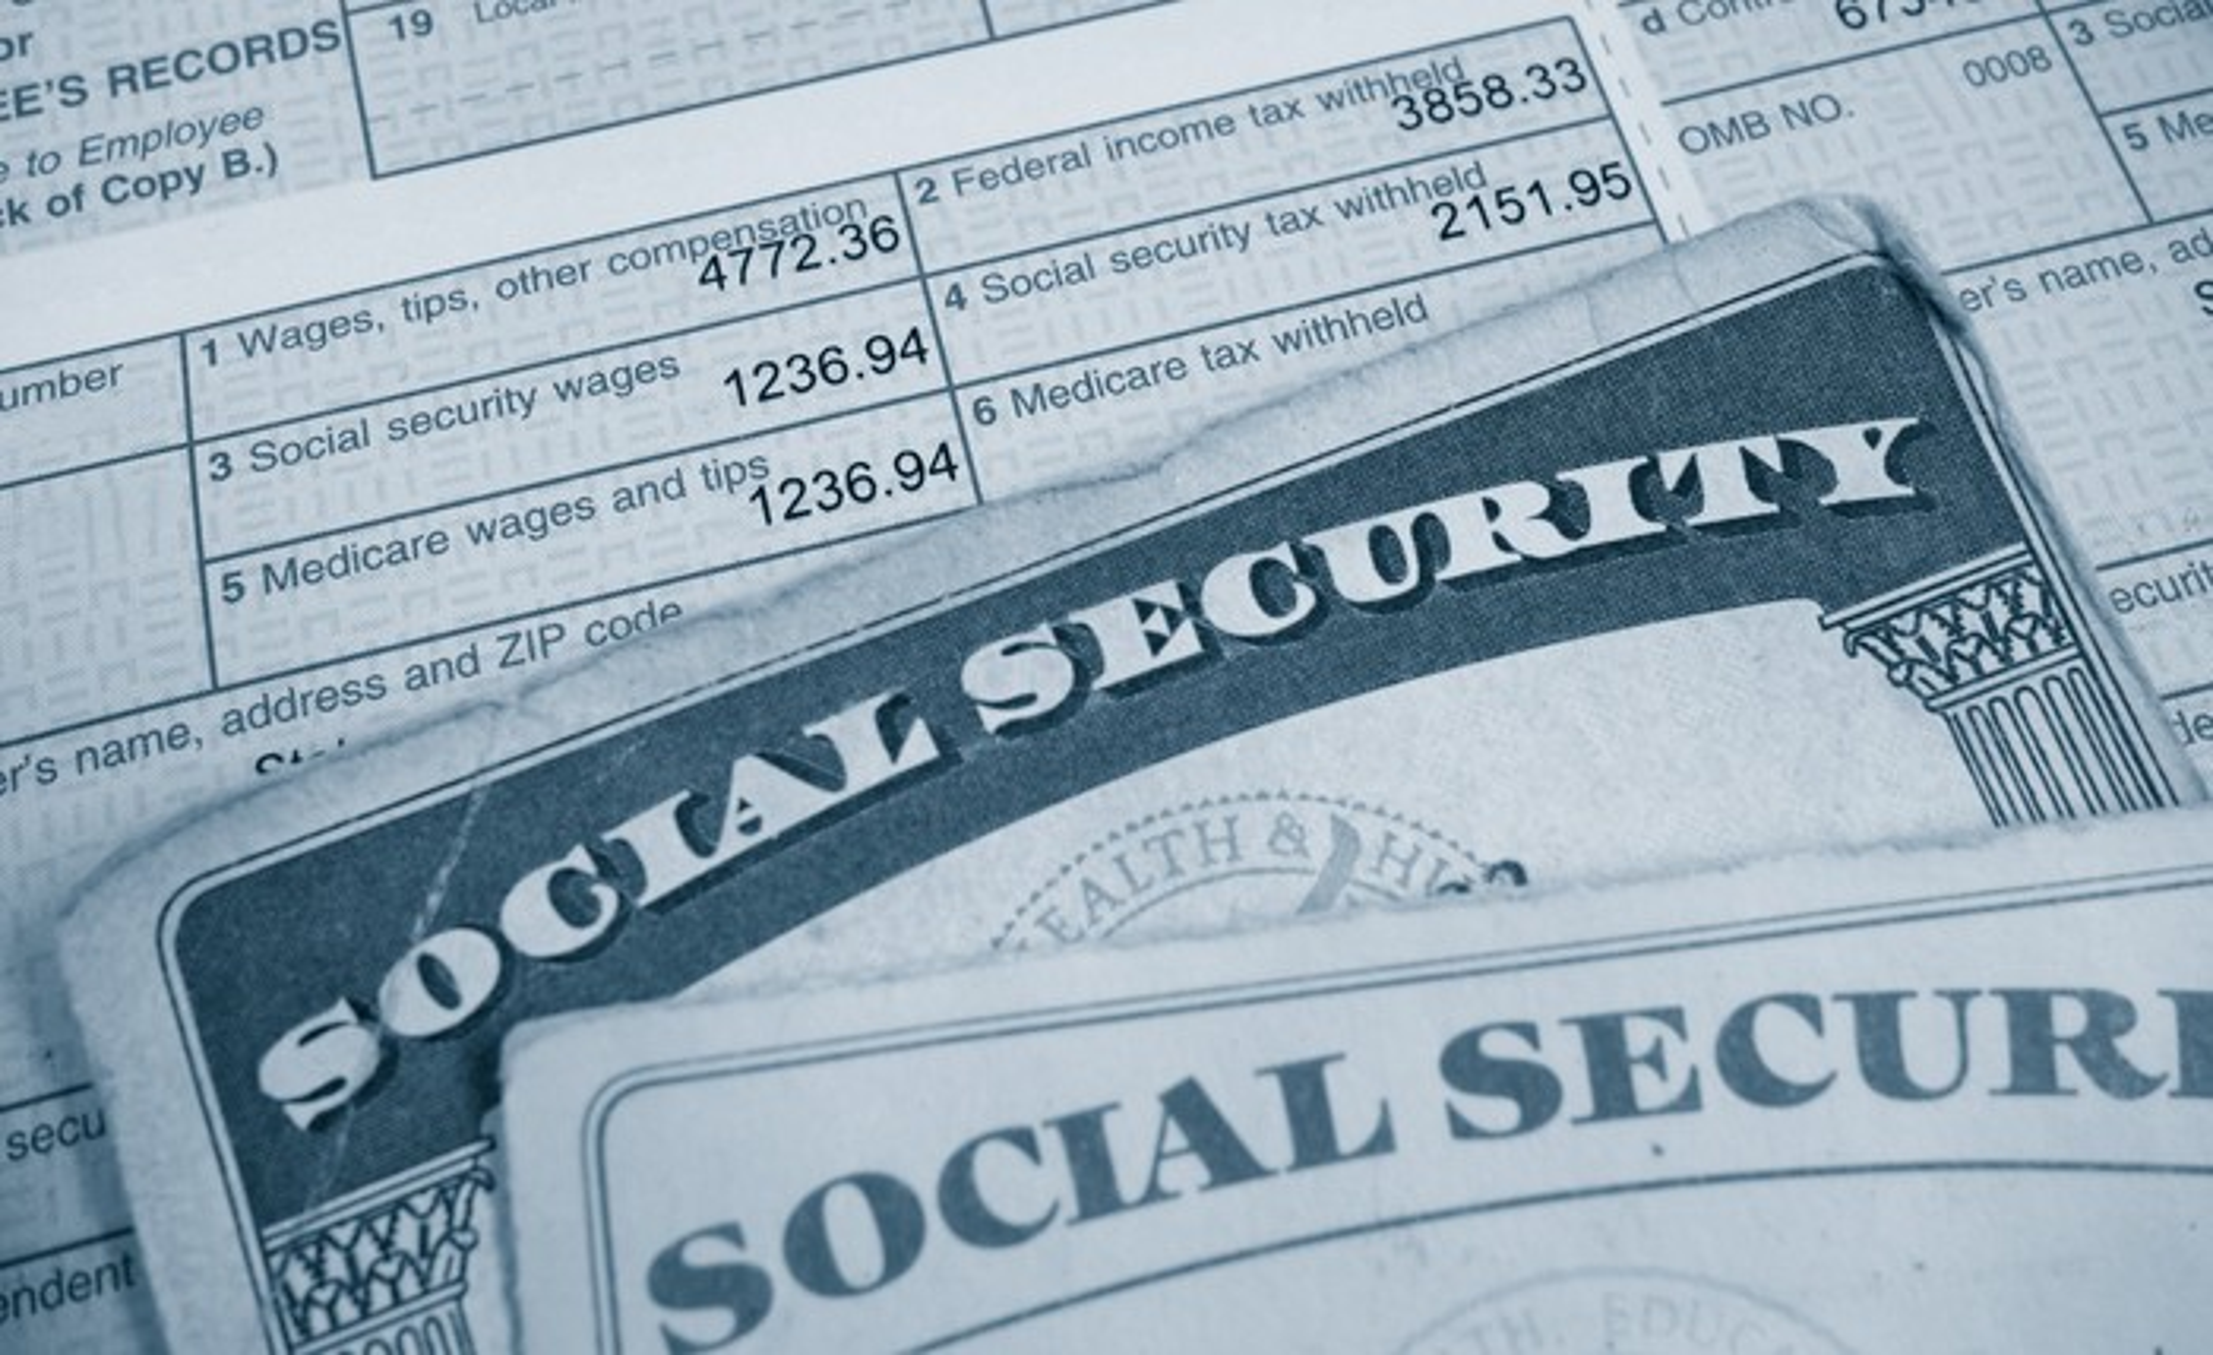 Social Security cards sitting atop a payroll stub.